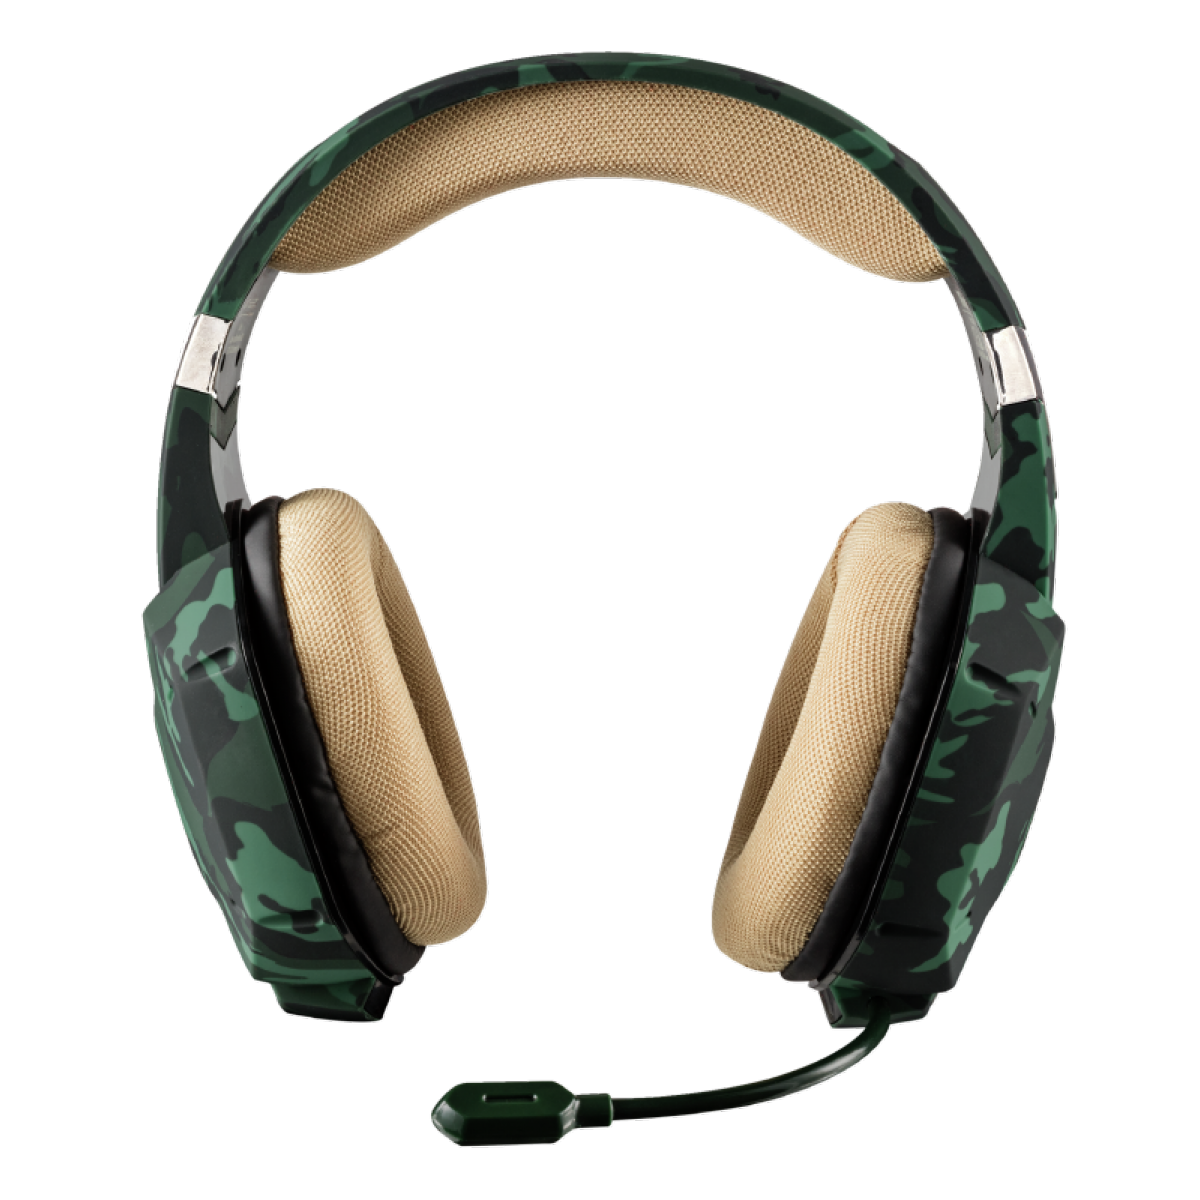 Headset GamerTrust Jungle Camo, Multiplataforma, GXT322C